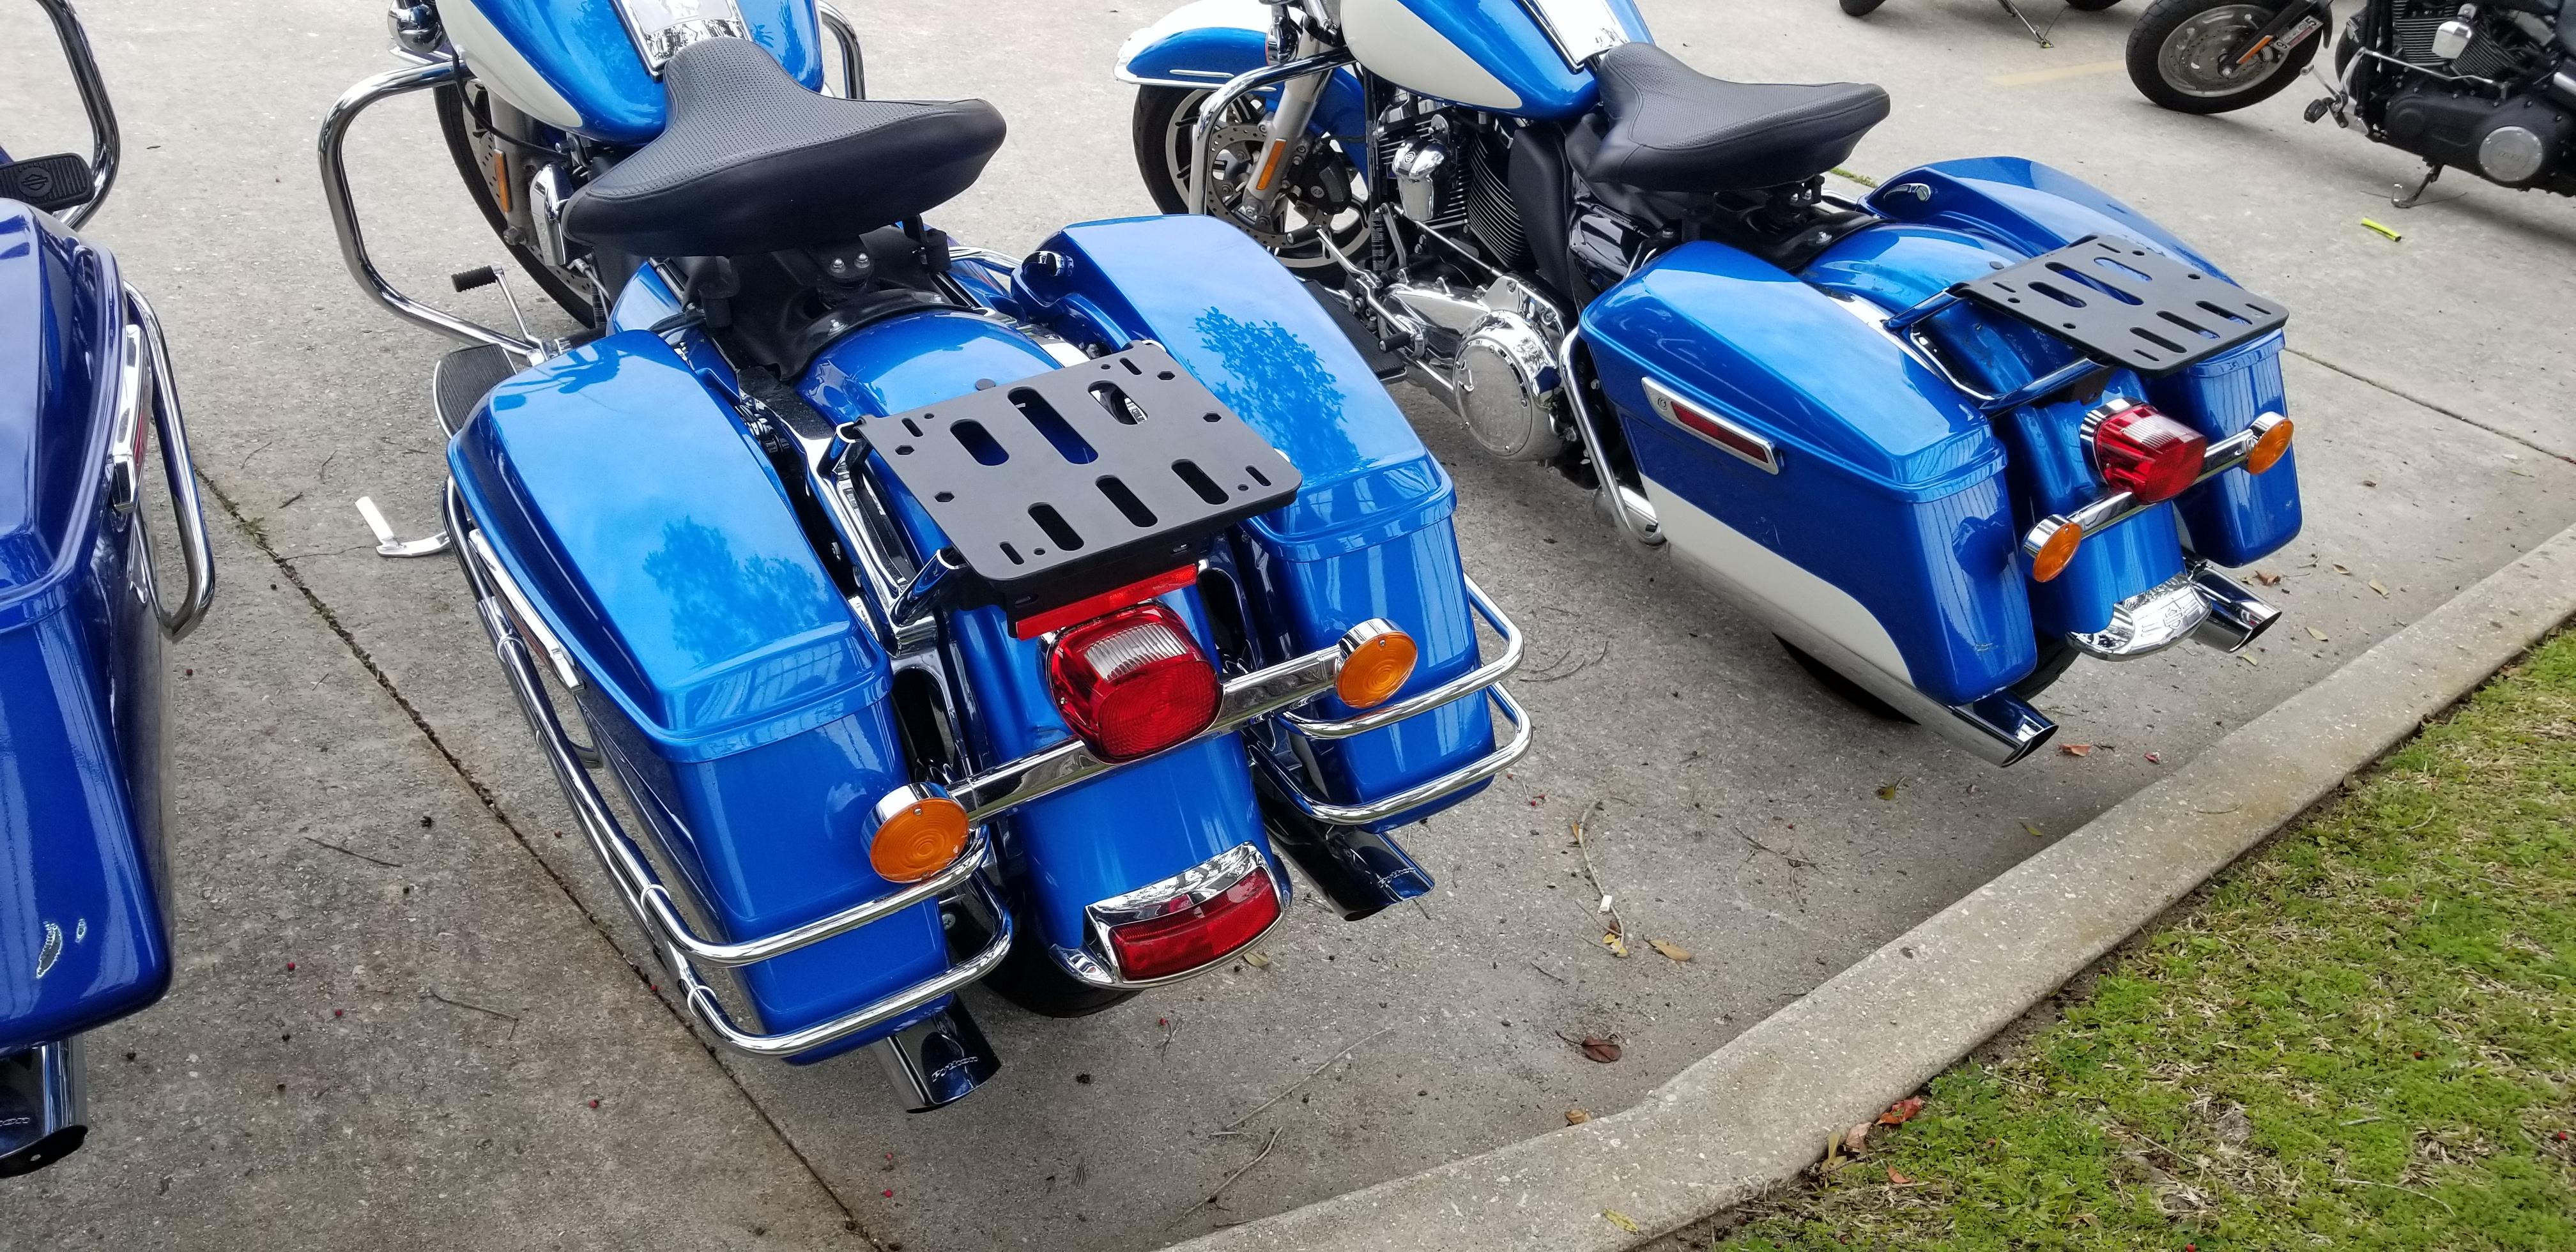 Pre-Owned 2018 Harley-Davidson Road King Police